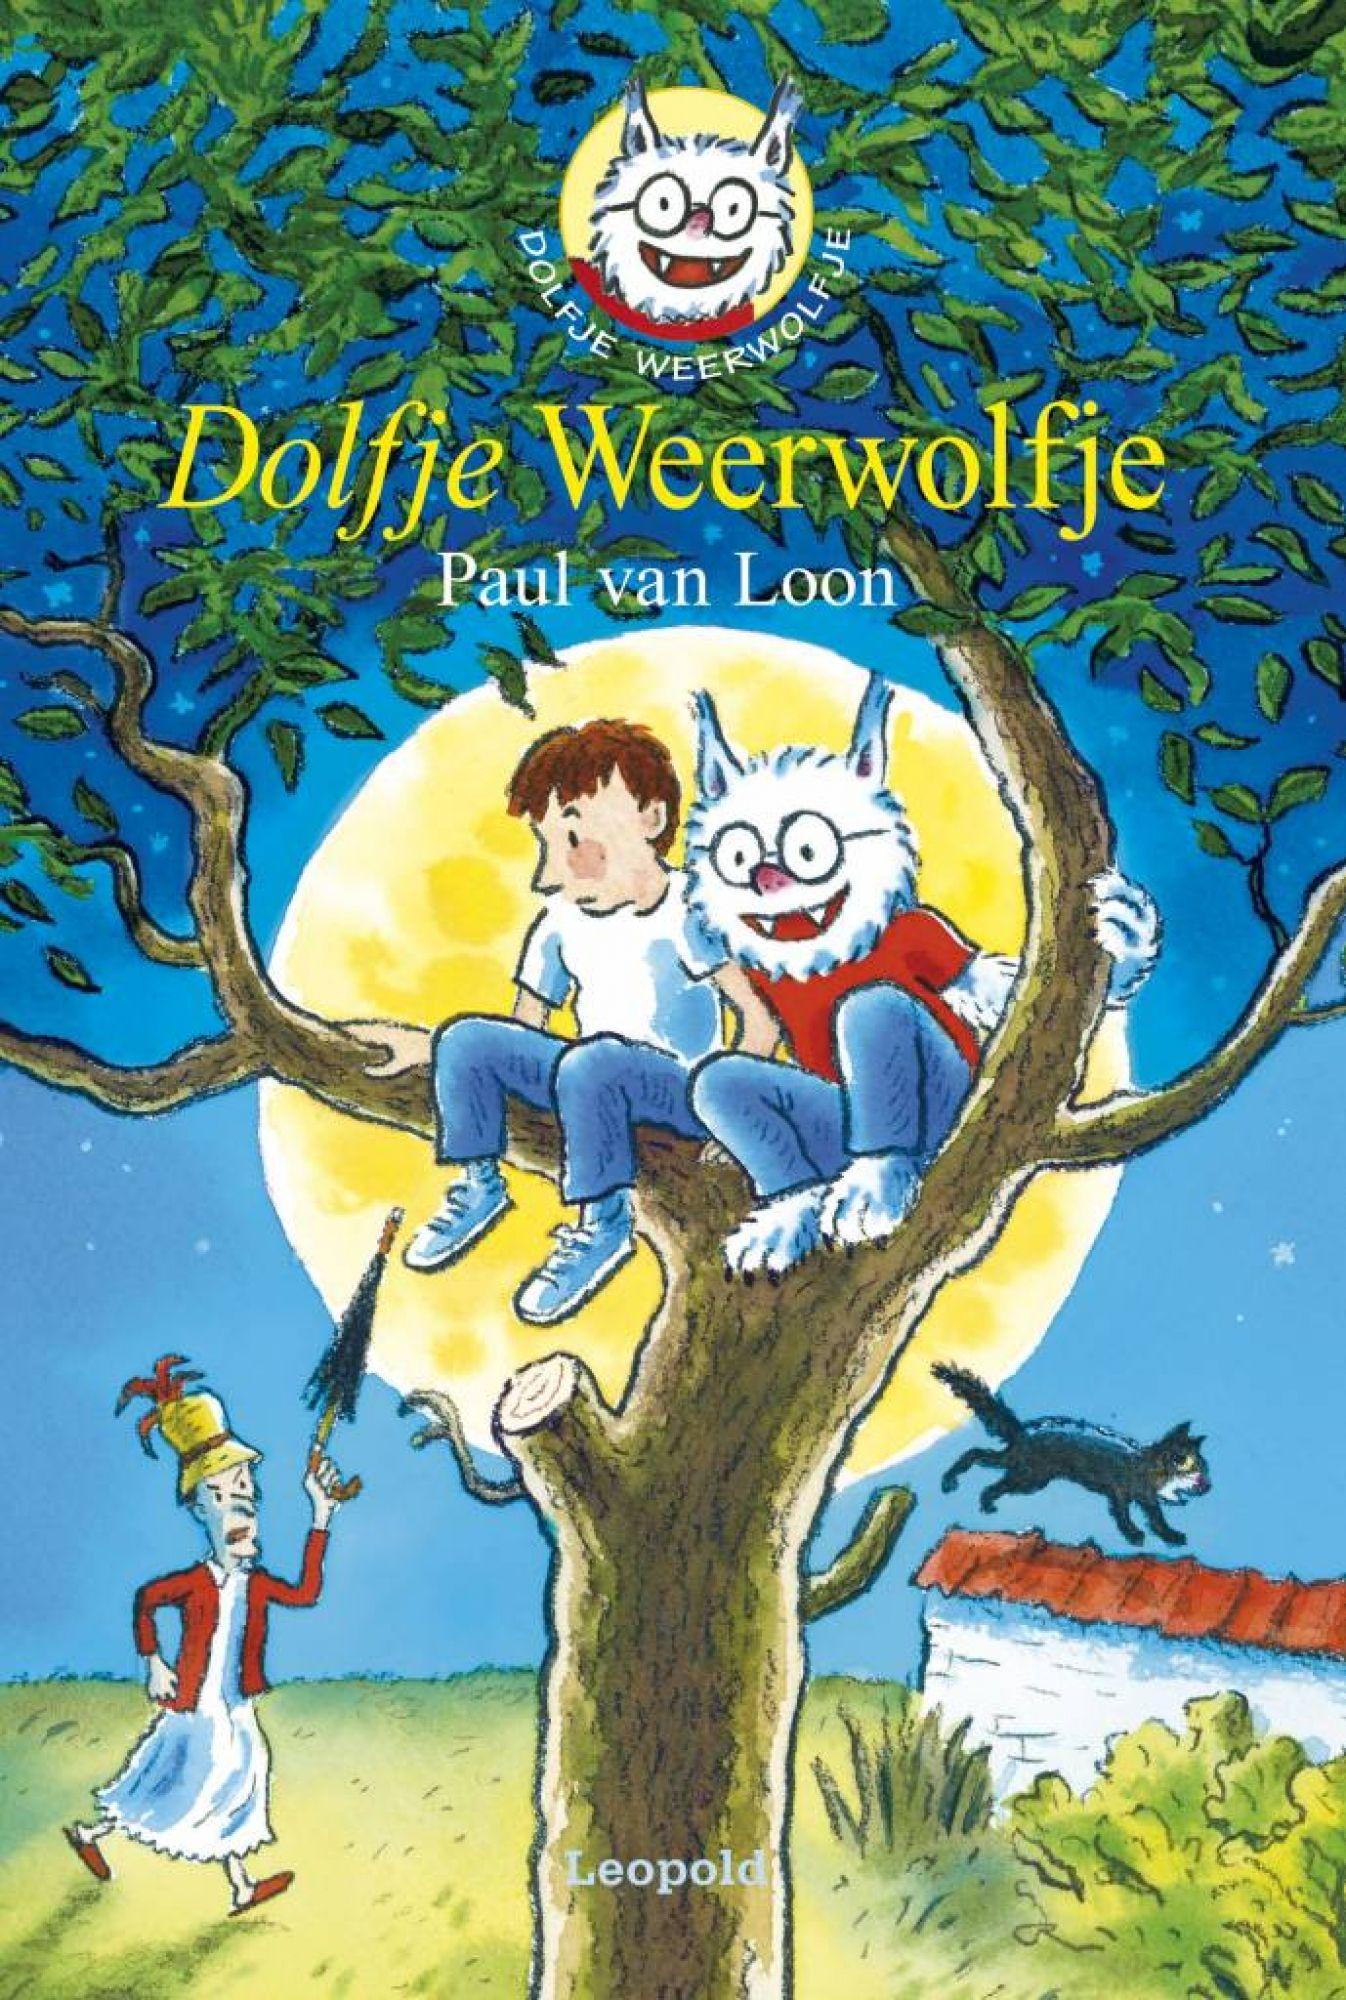 Wonderlijk Voorleesboek groep 3/4/5/6 Dolfje Weerwolfje - Paul van Loon (met WW-16